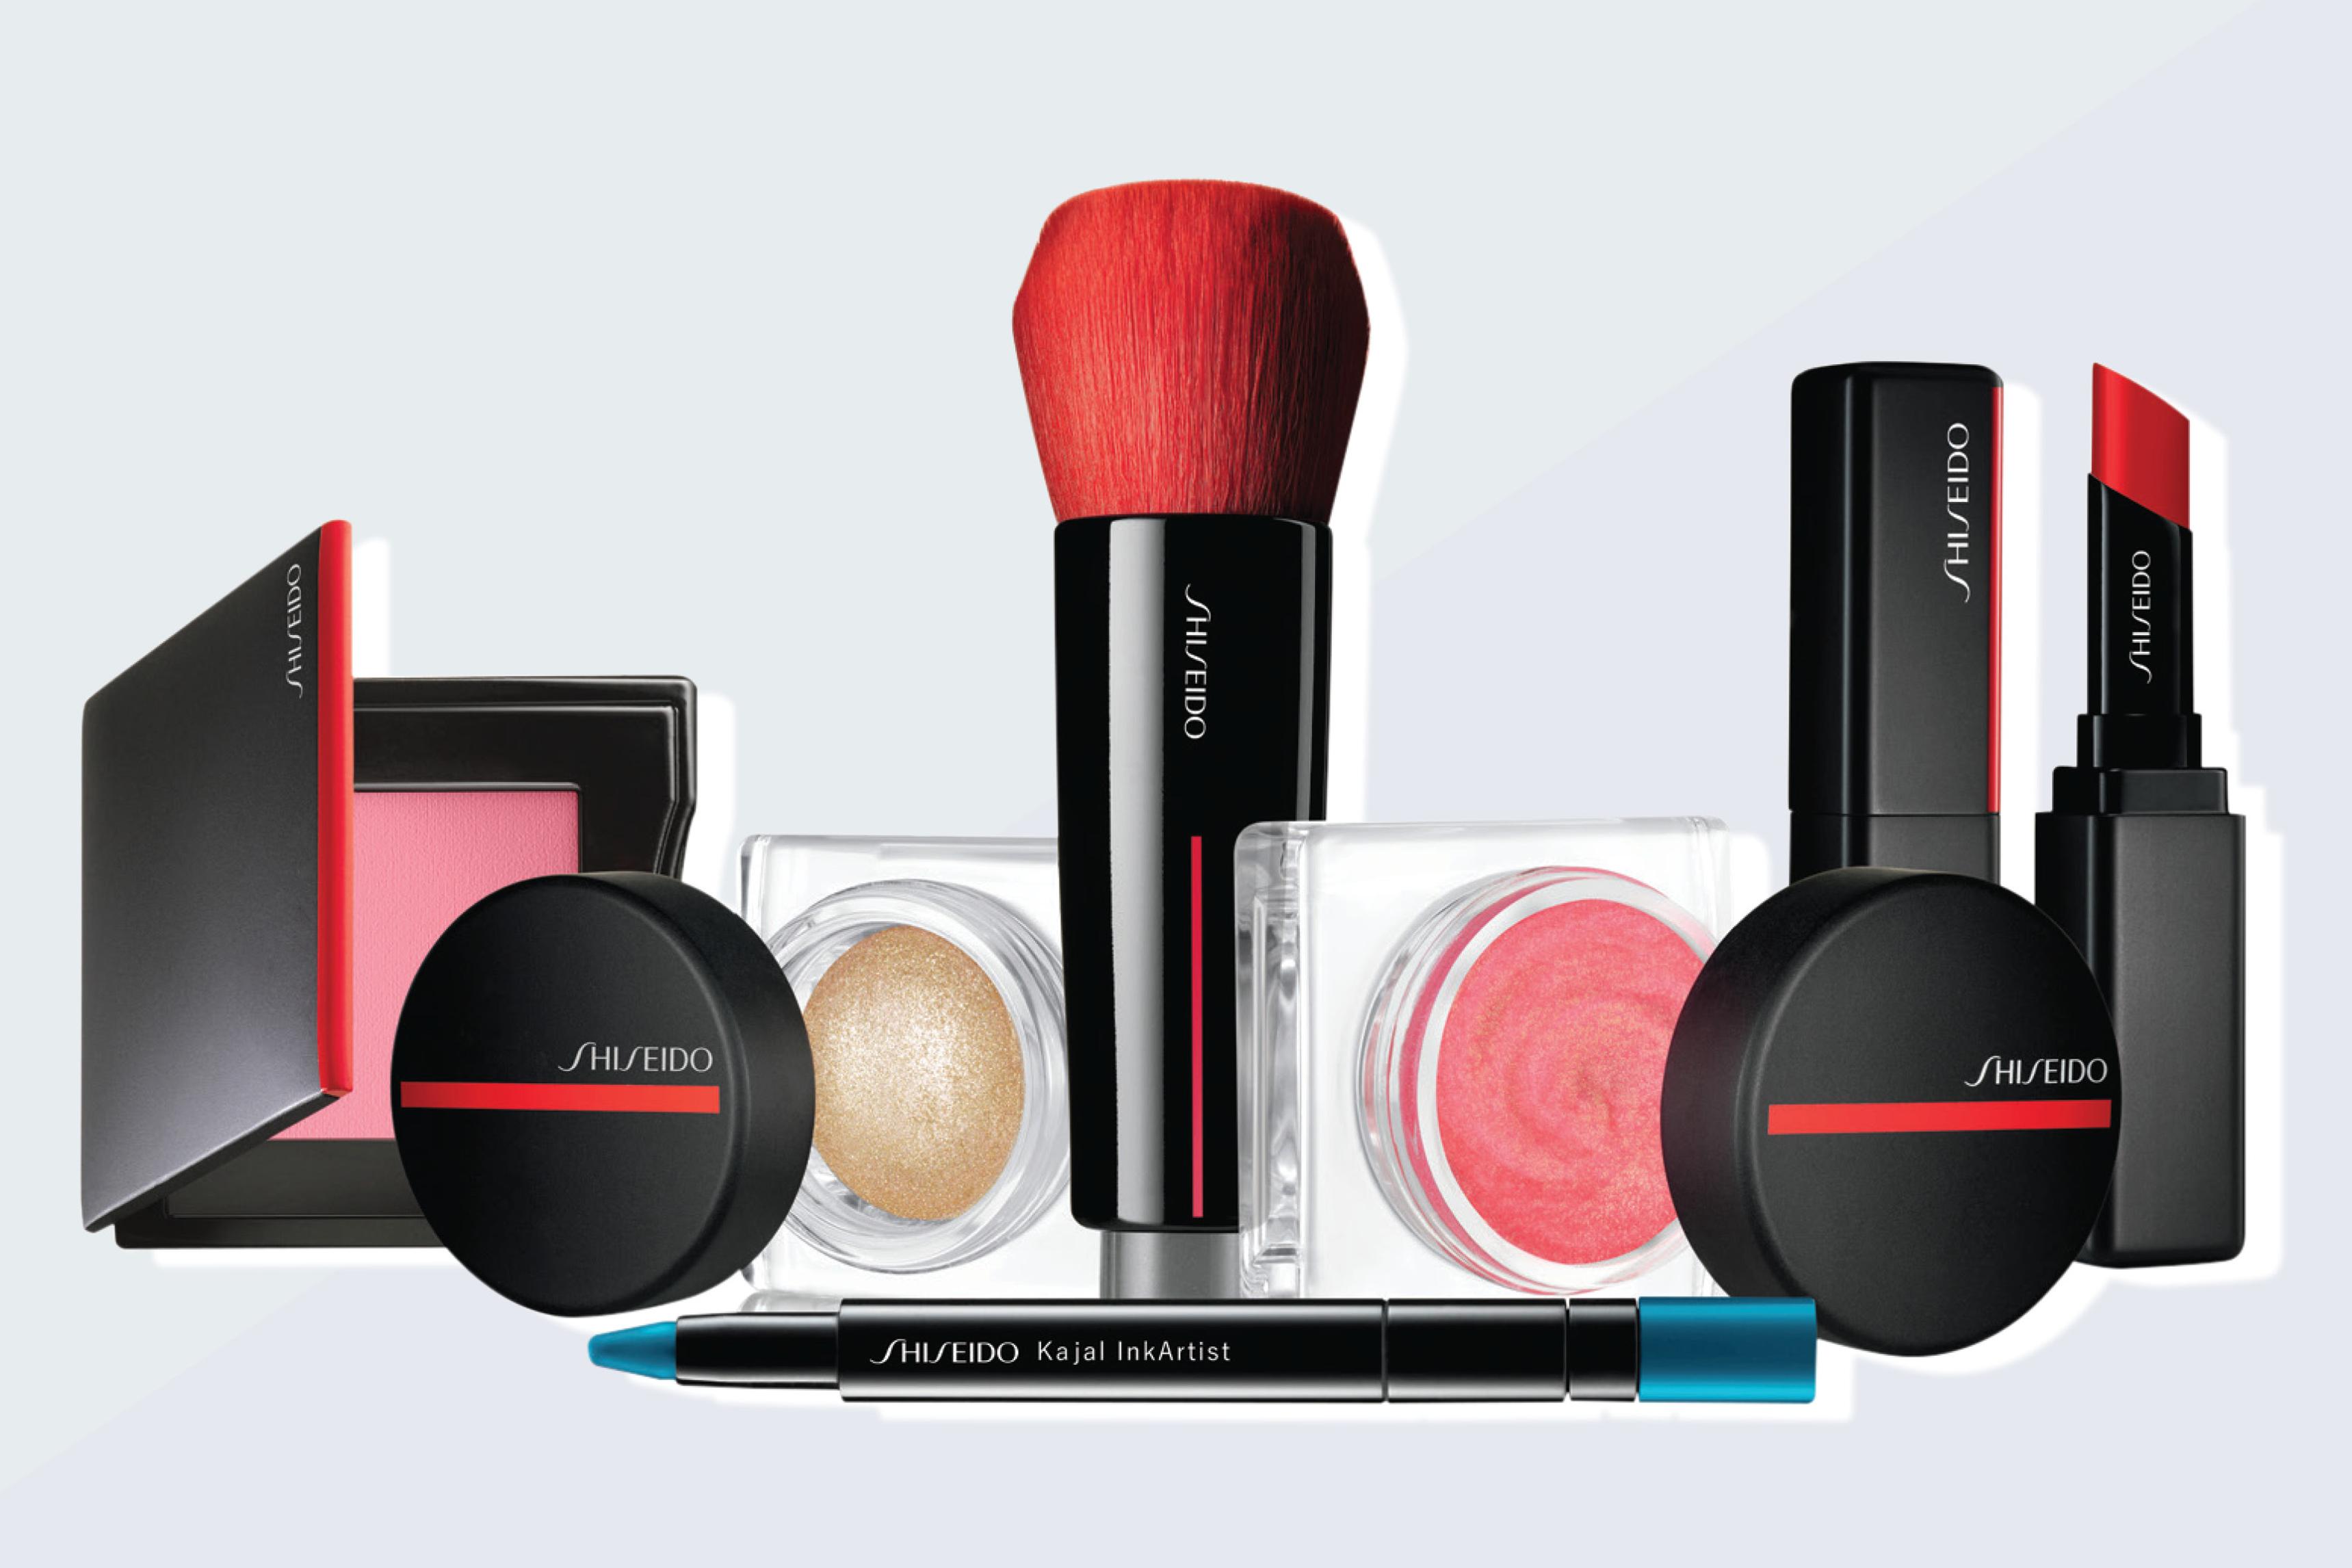 5dfd8127-9607-459f-9a3e-486450897035-shiseido-header-jpg